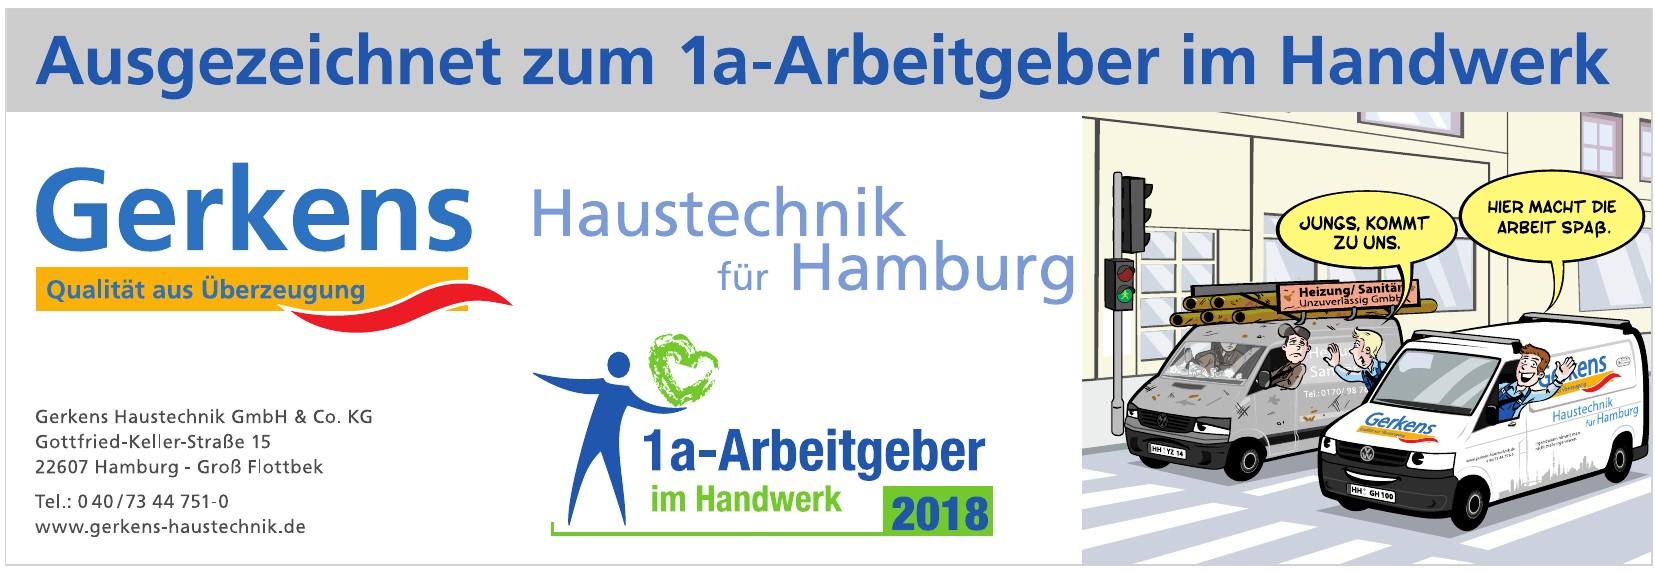 Gerkens Haustechnik GmbH & Co.KG